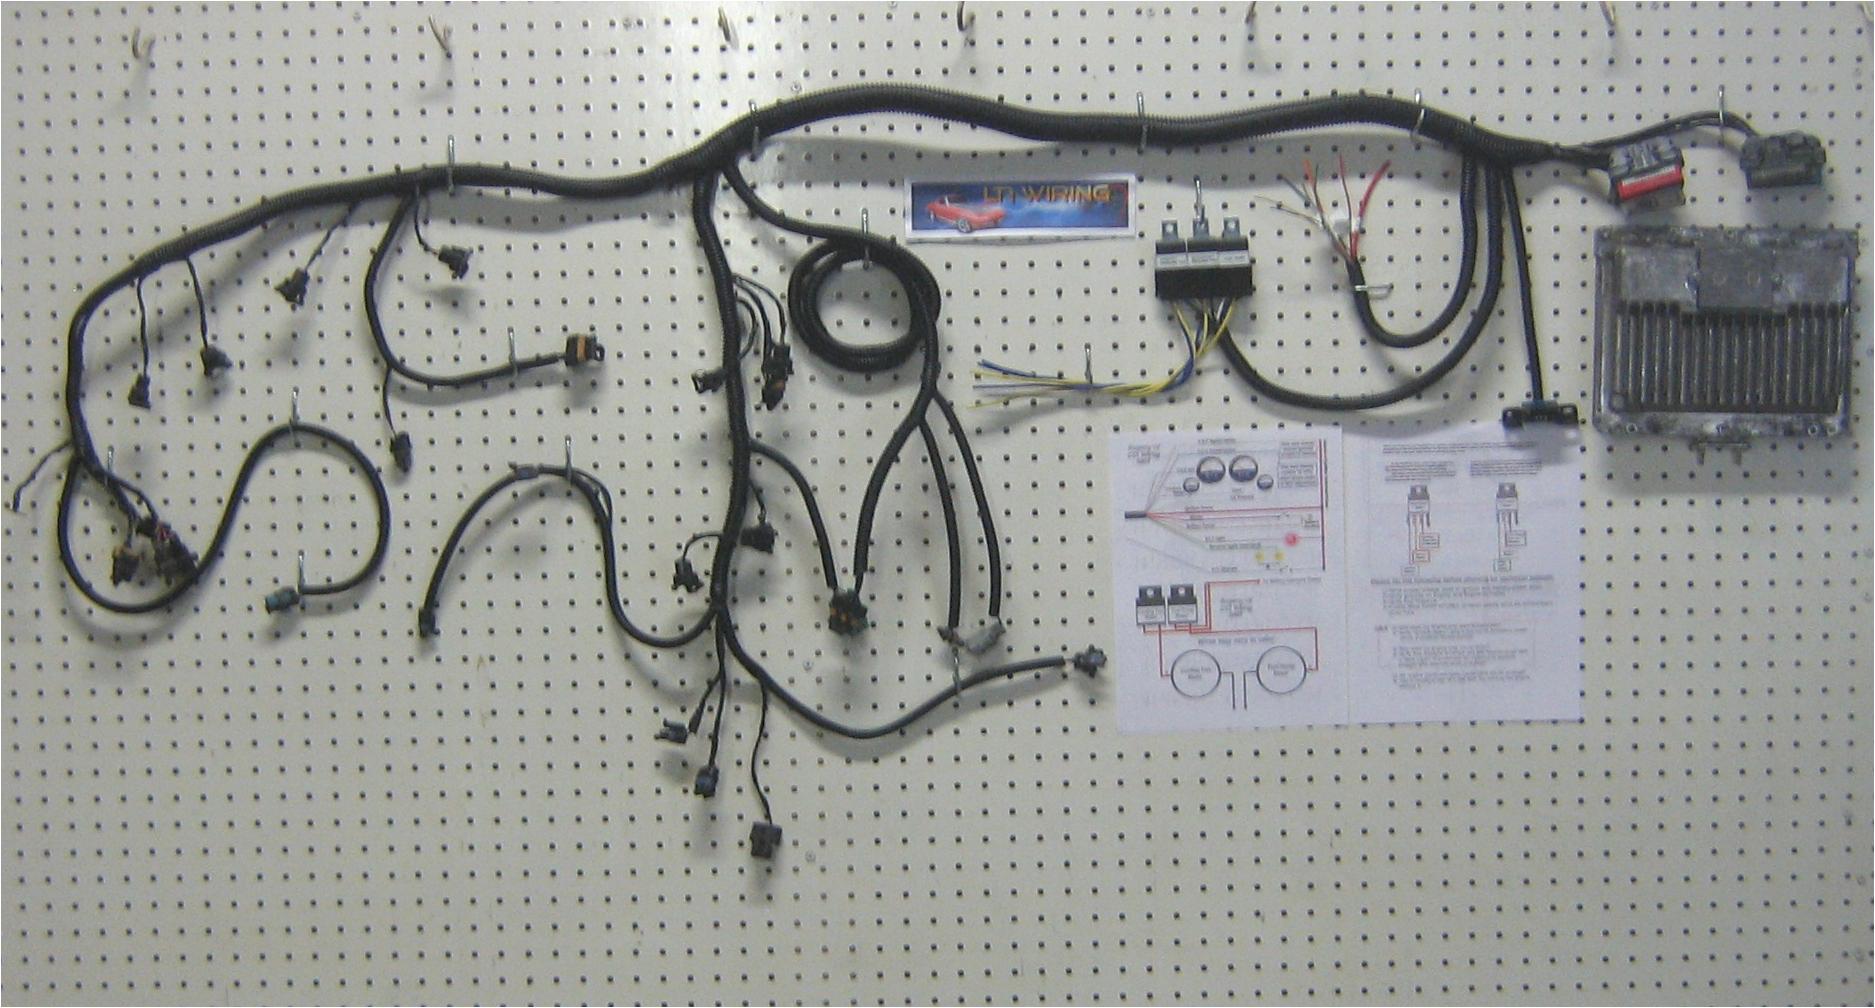 1993 lt1 standalone wiring harness wiring diagram host93 lt1 wiring harness diagram schematic 9